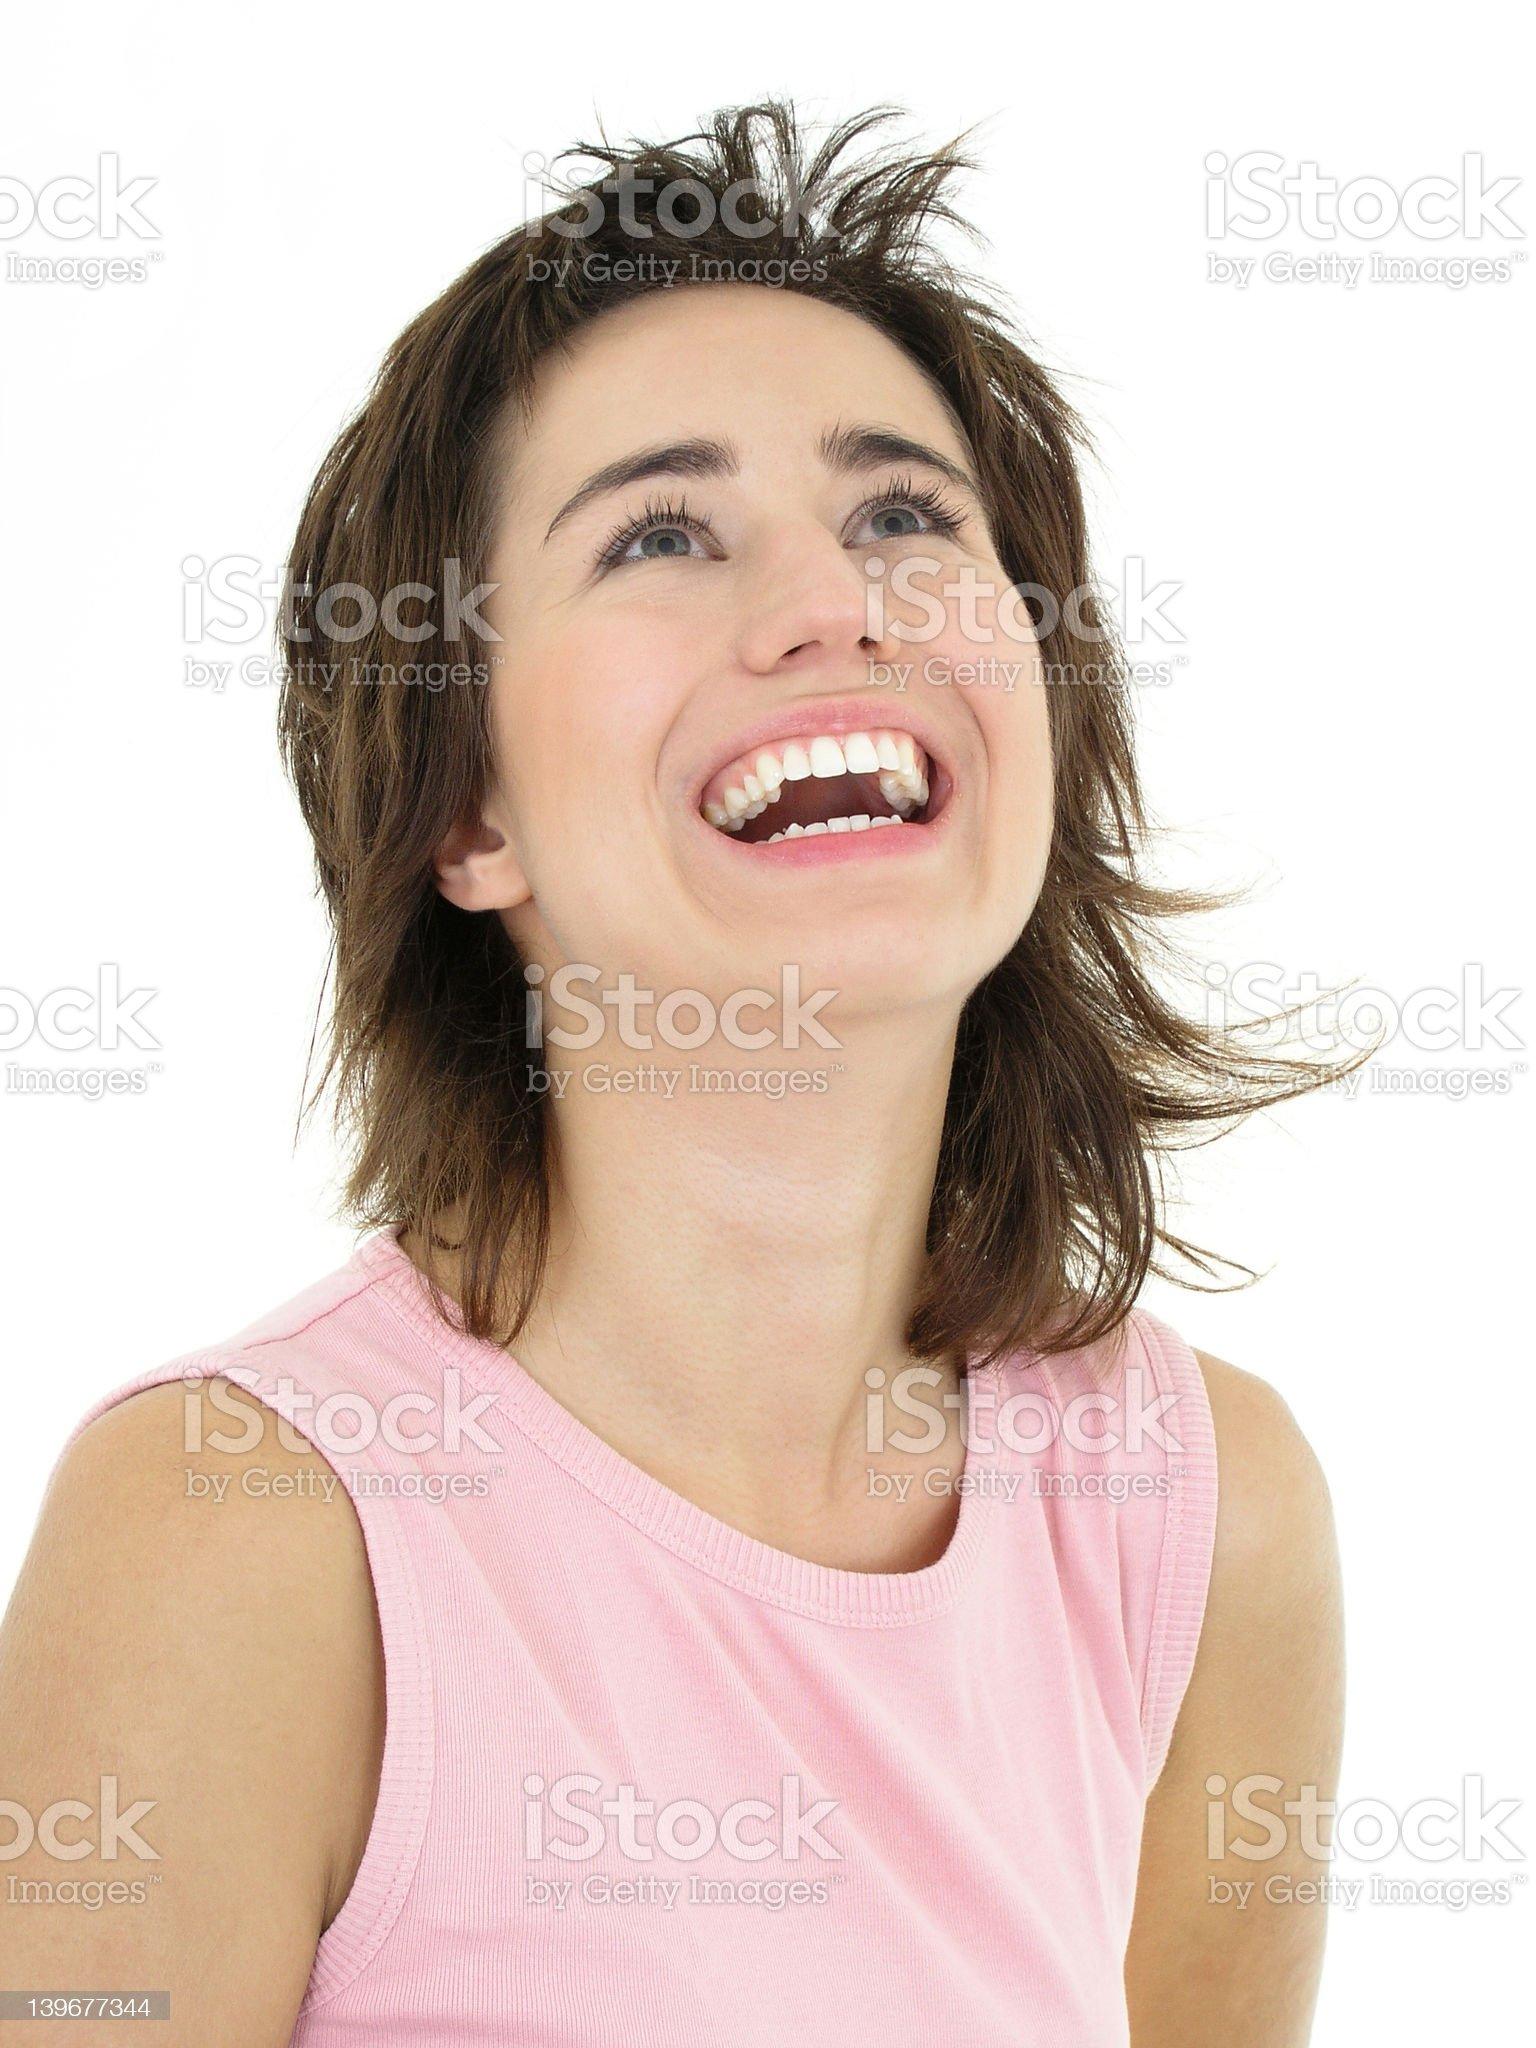 Girl laughing royalty-free stock photo